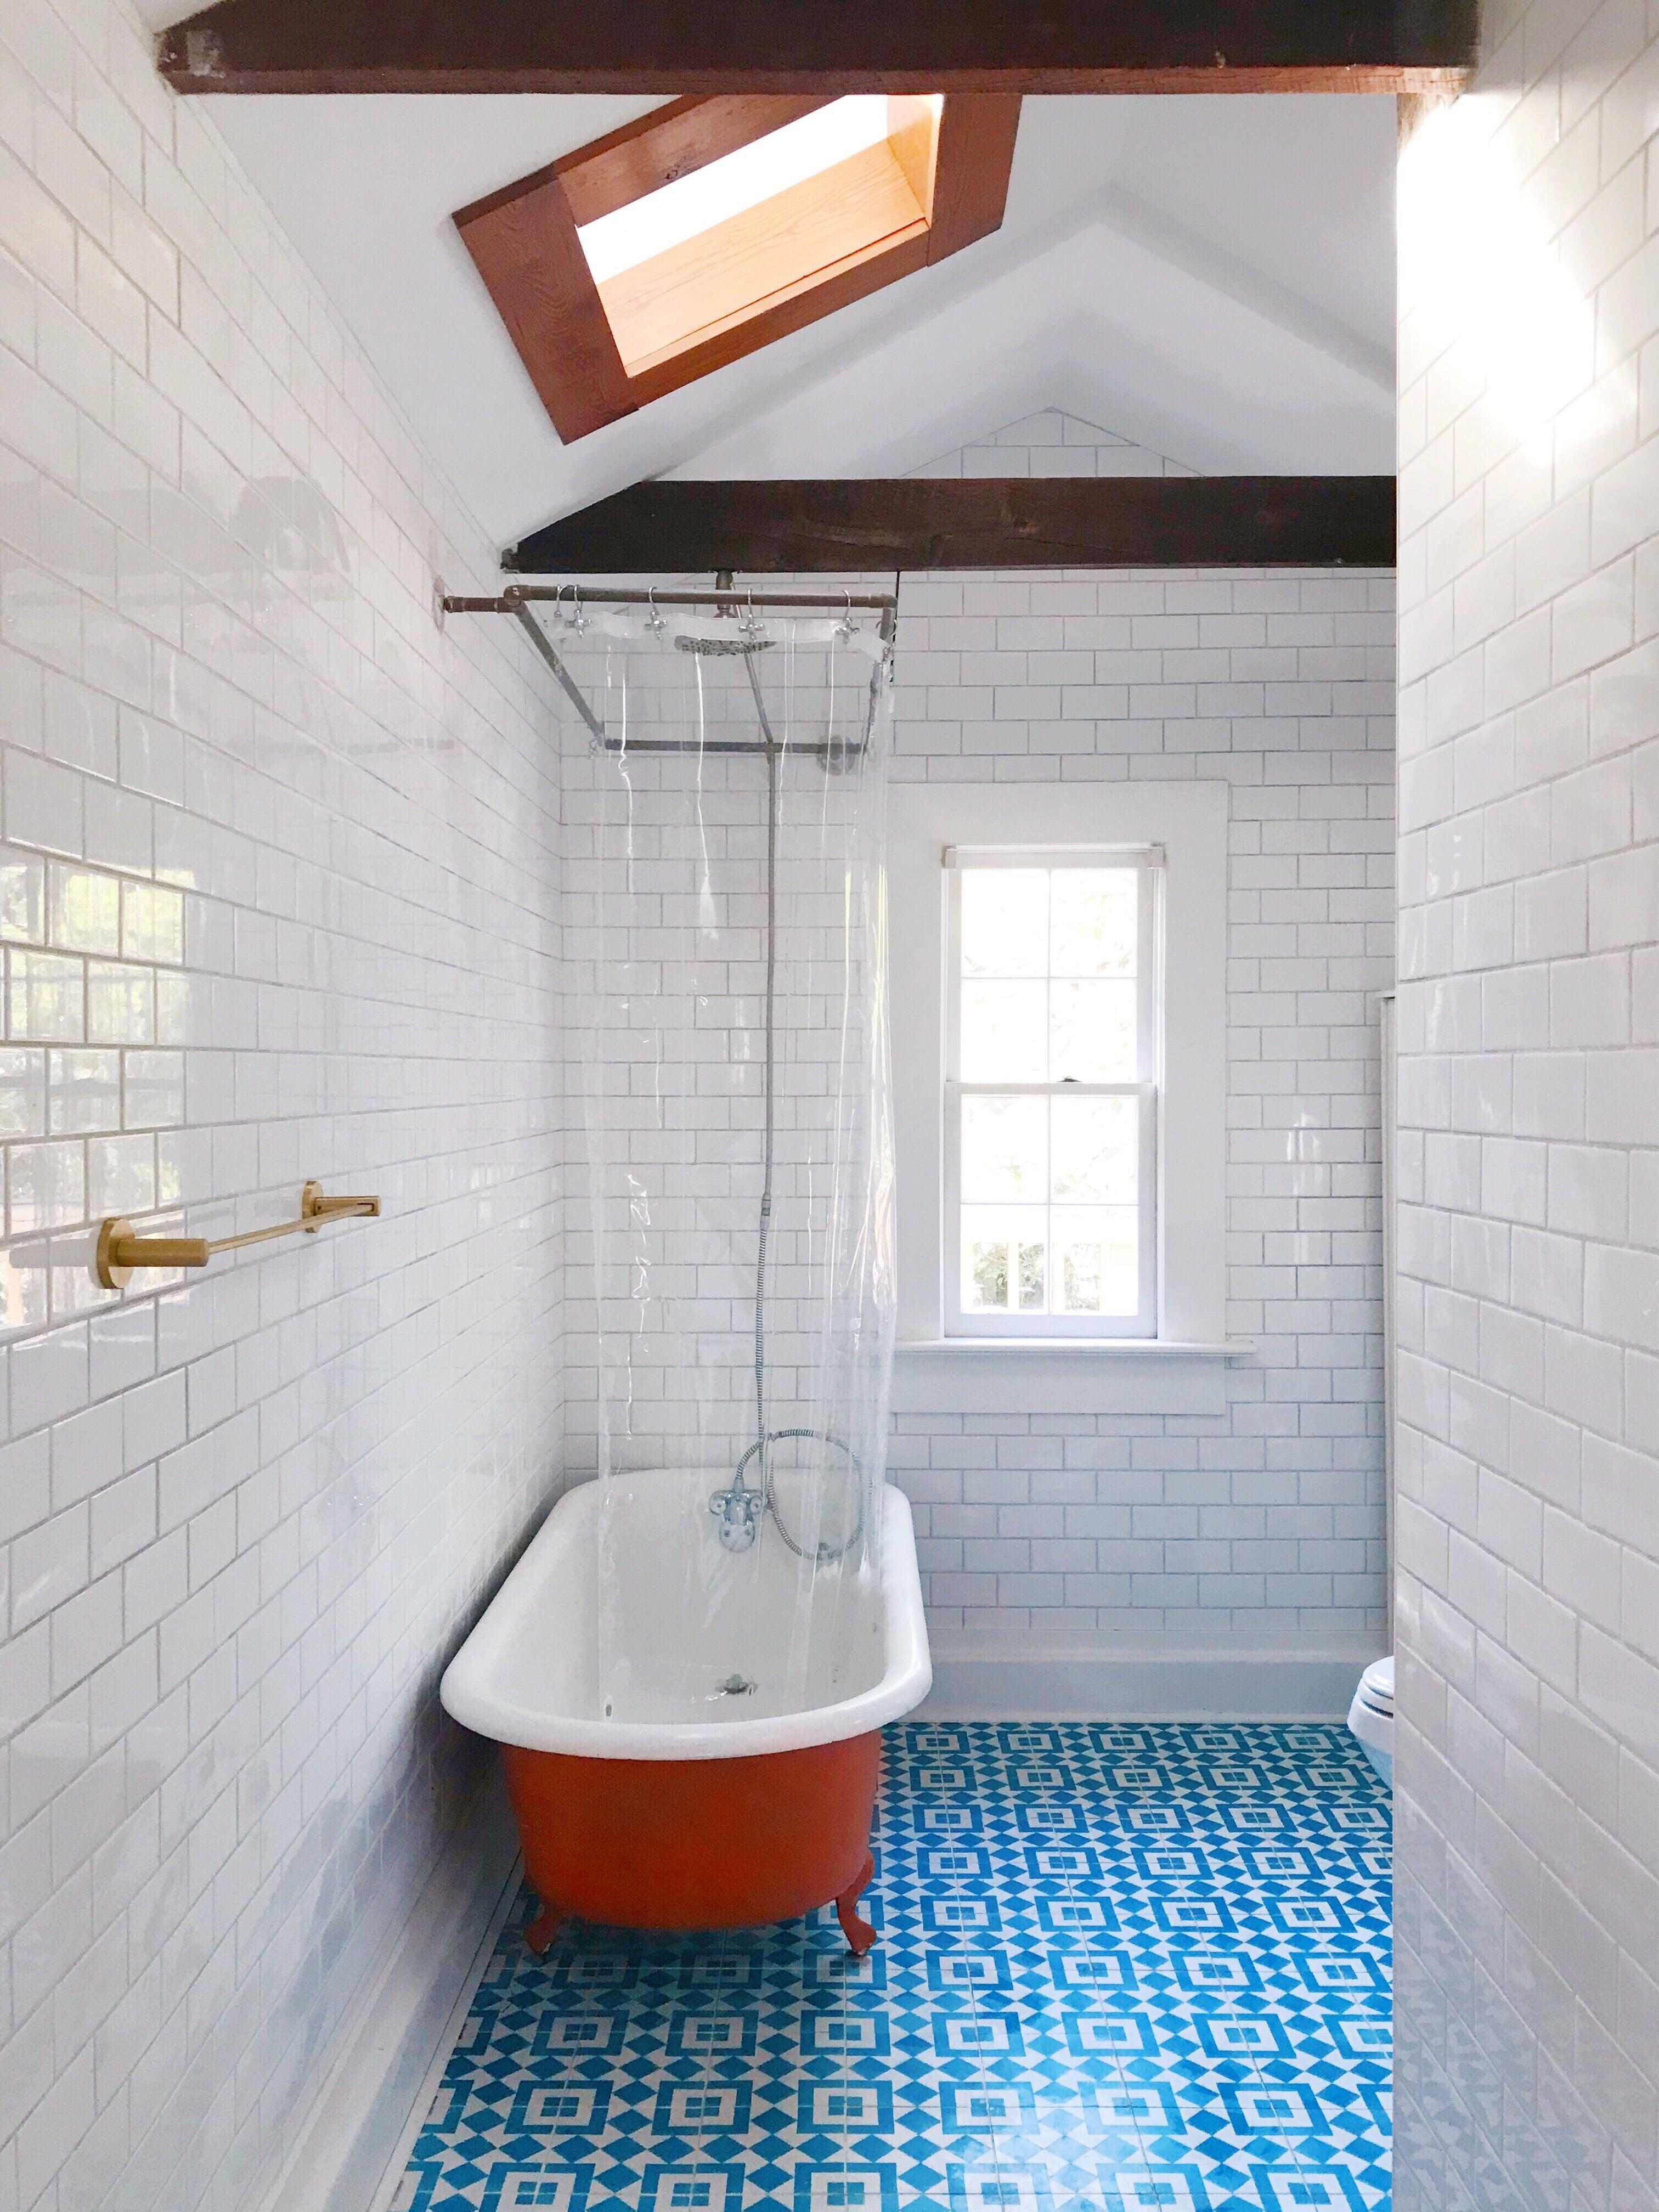 tiled bathroom - subway tiles and mosaic on floor